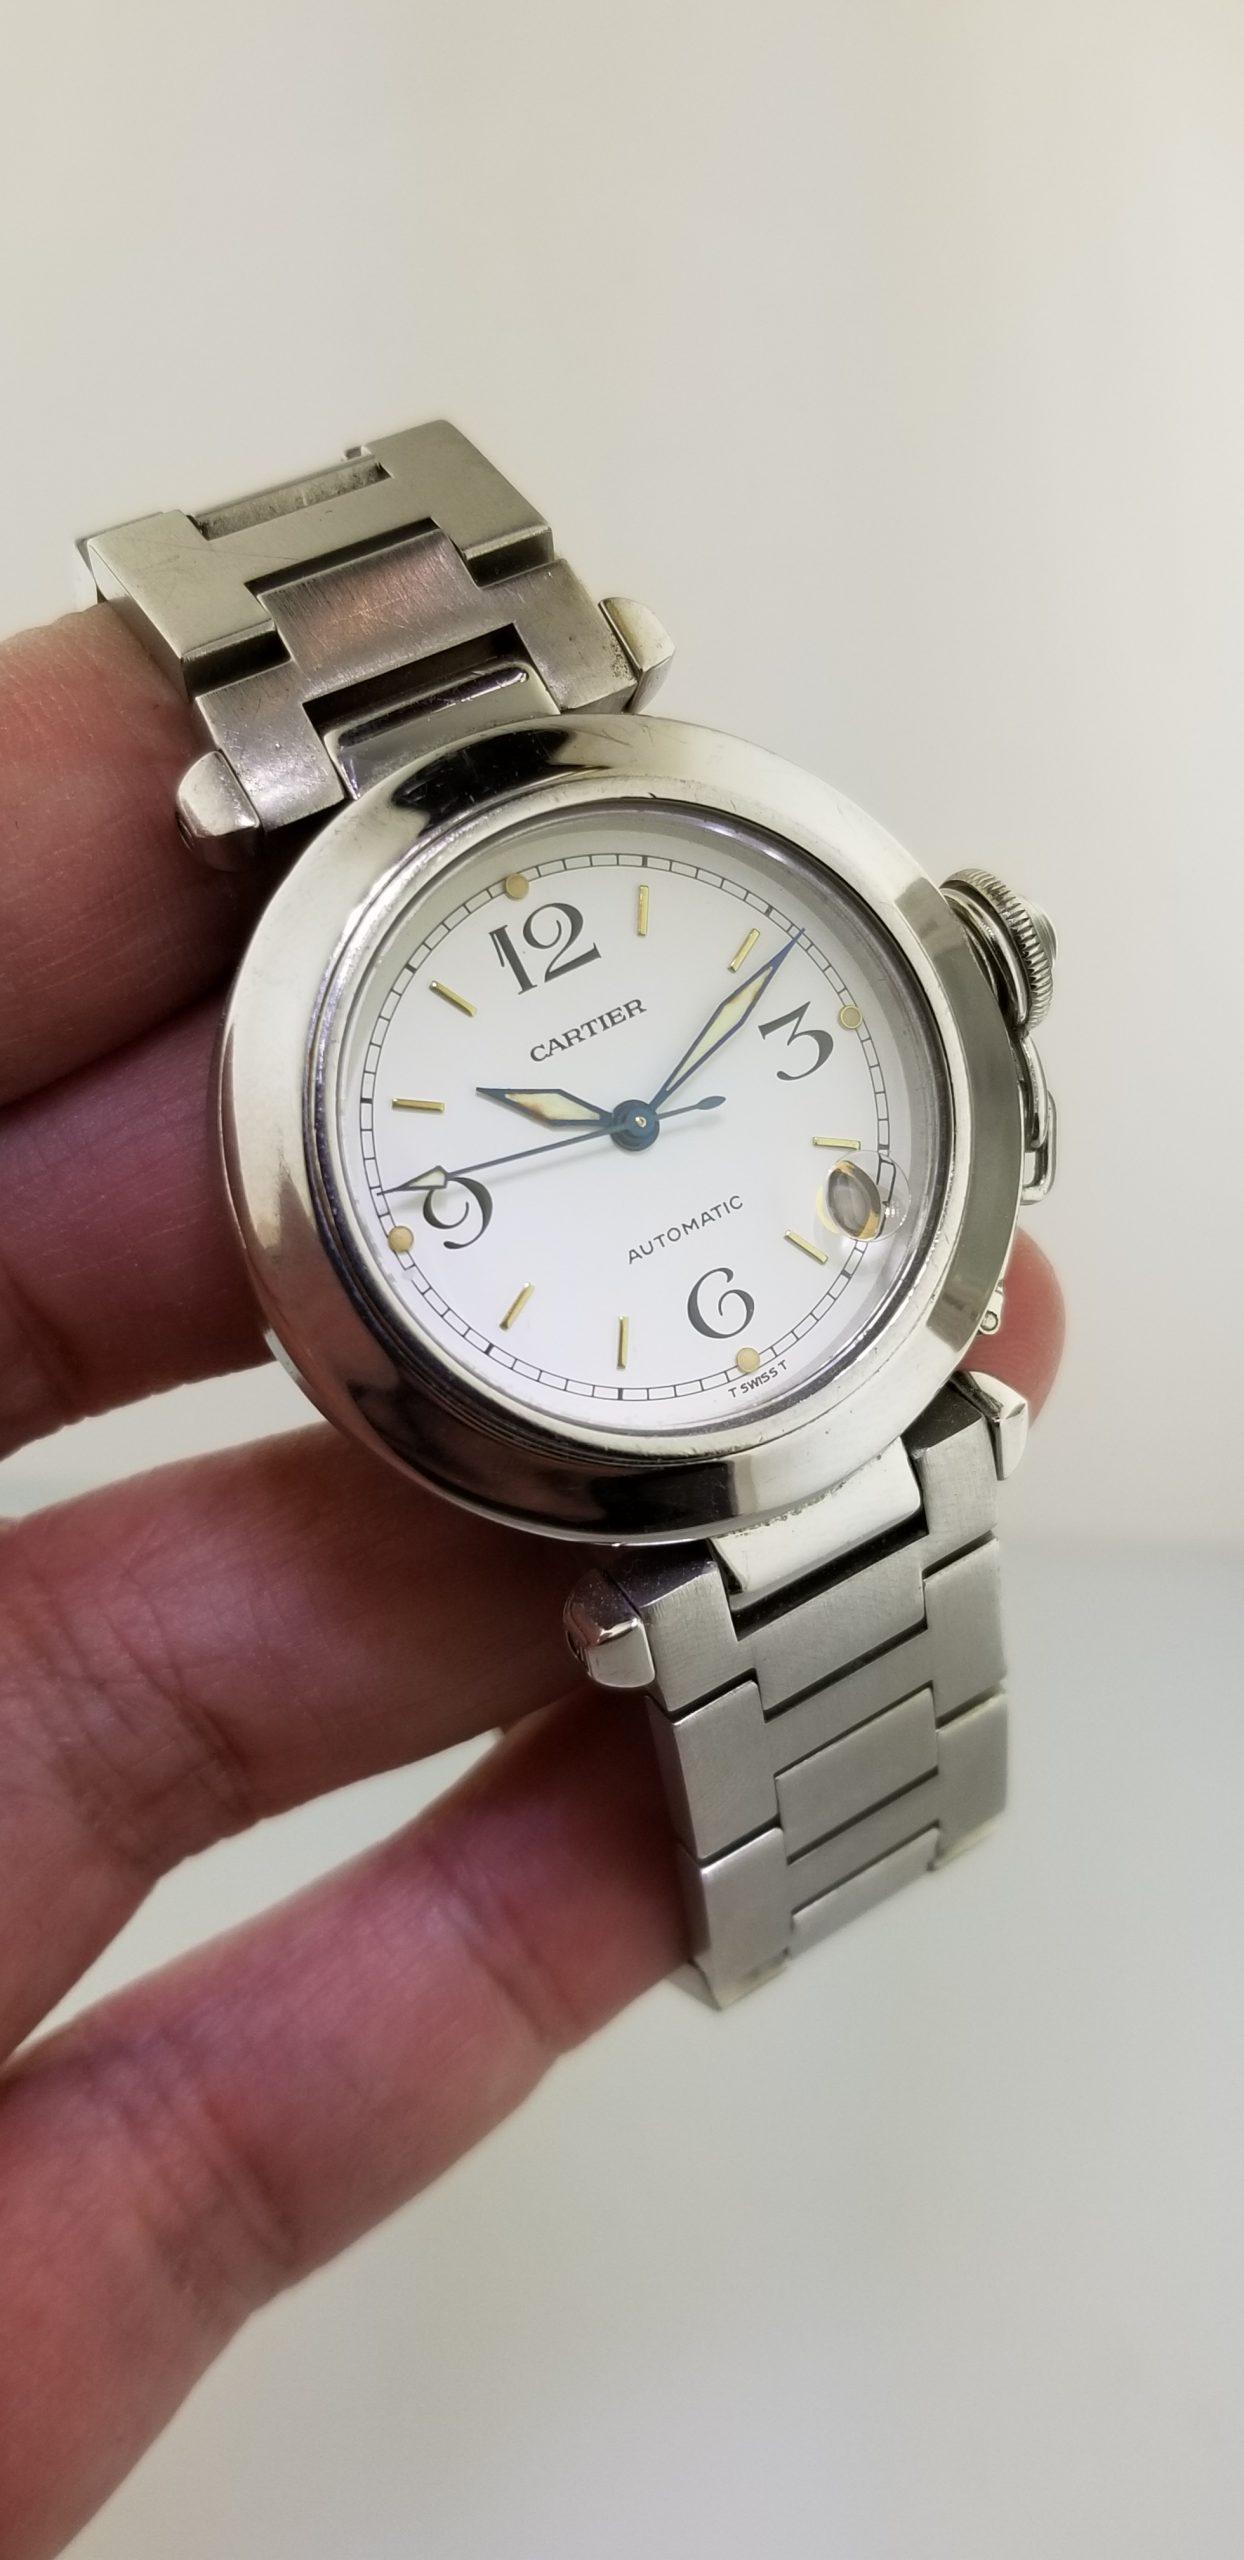 Cartier Pasha De Cartier White Dial Automatic Reference W31015M7